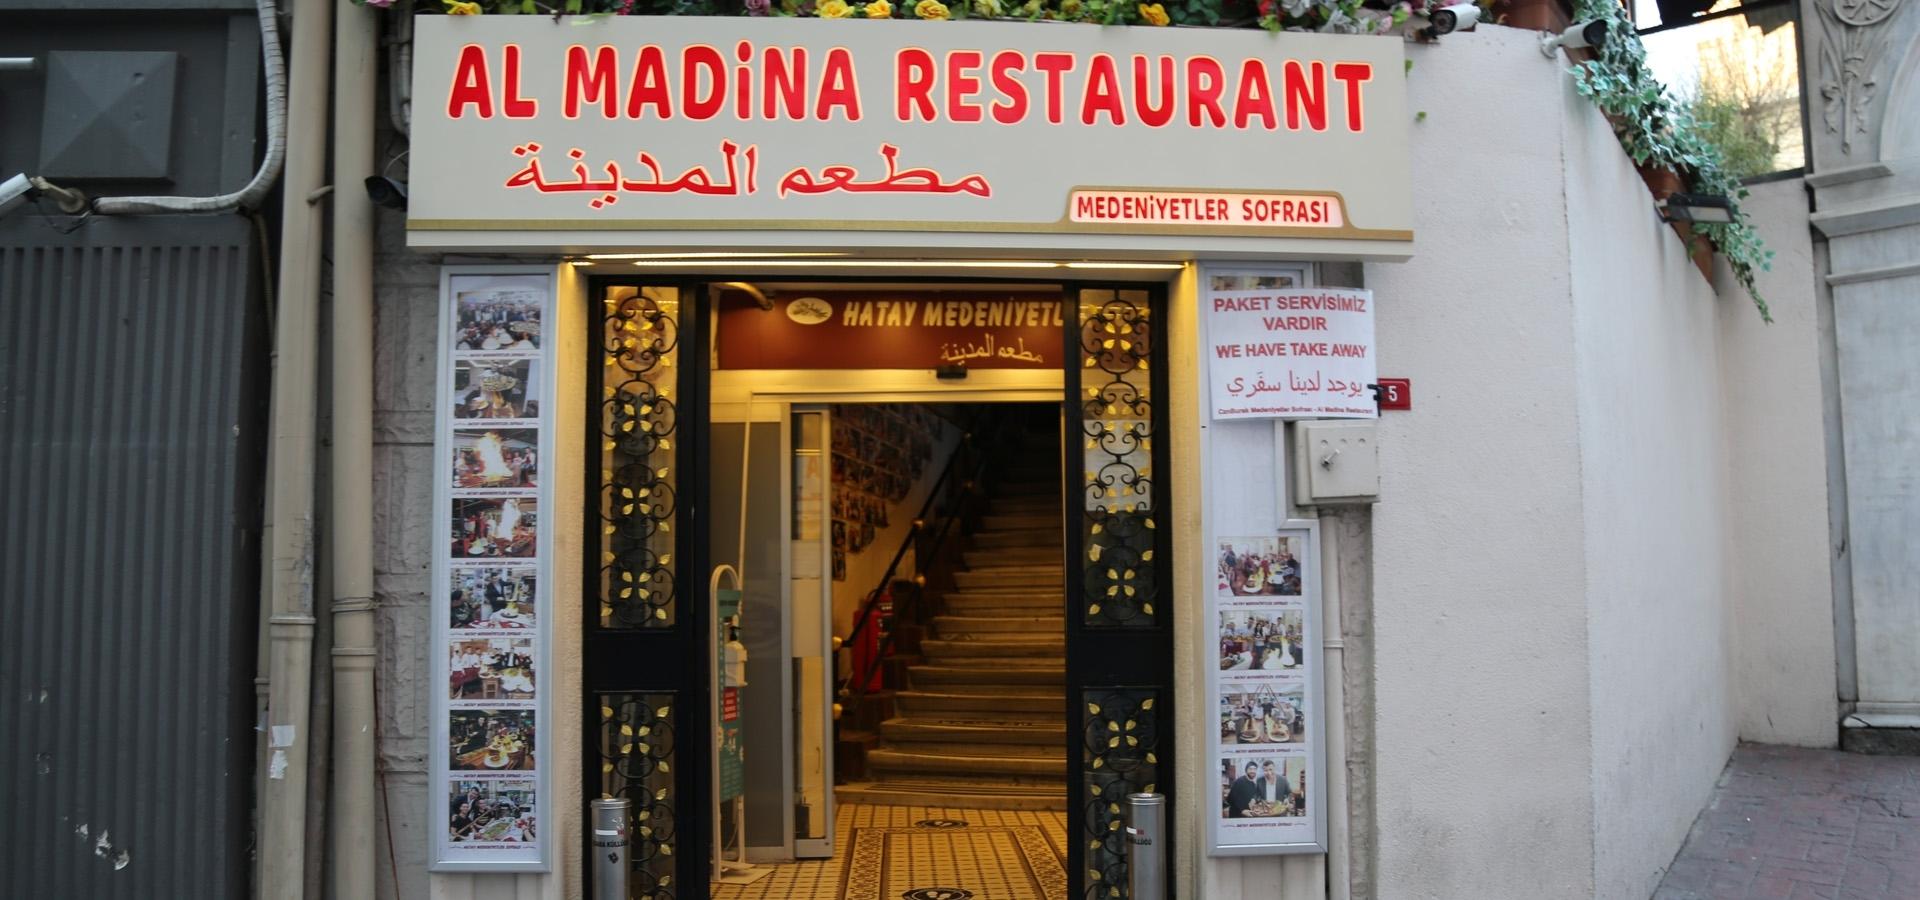 Al Madina Restaurant